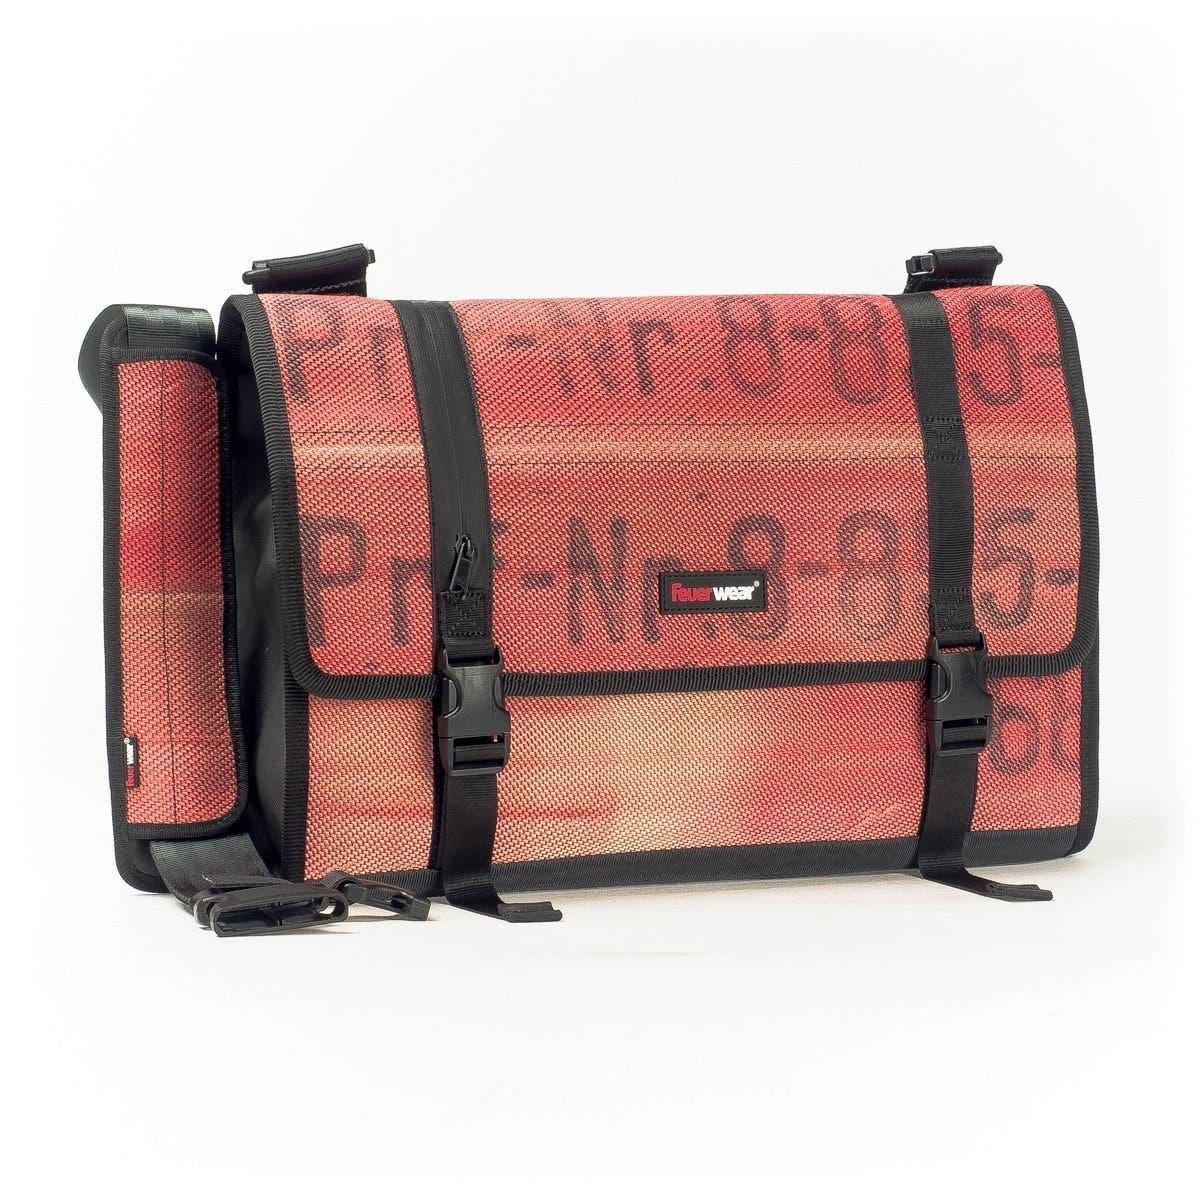 Feuerwear Messenger Bag Gordon 18L